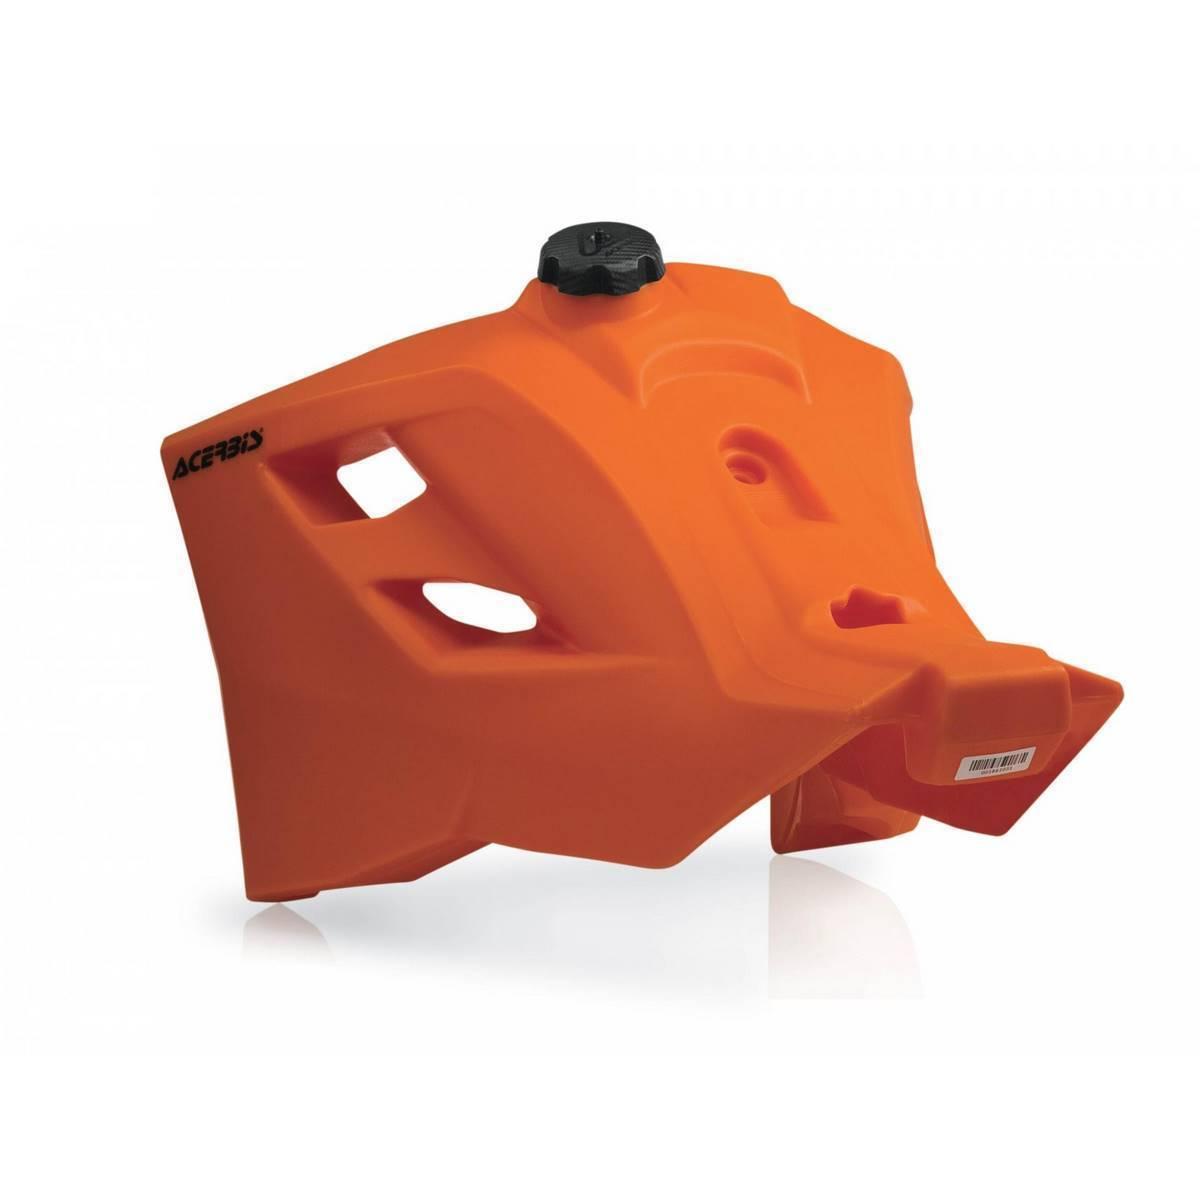 Depósito Acerbis KTM EXC/EXC-F 08-11 SX/SX-F 07-10 24Litros NARANJA